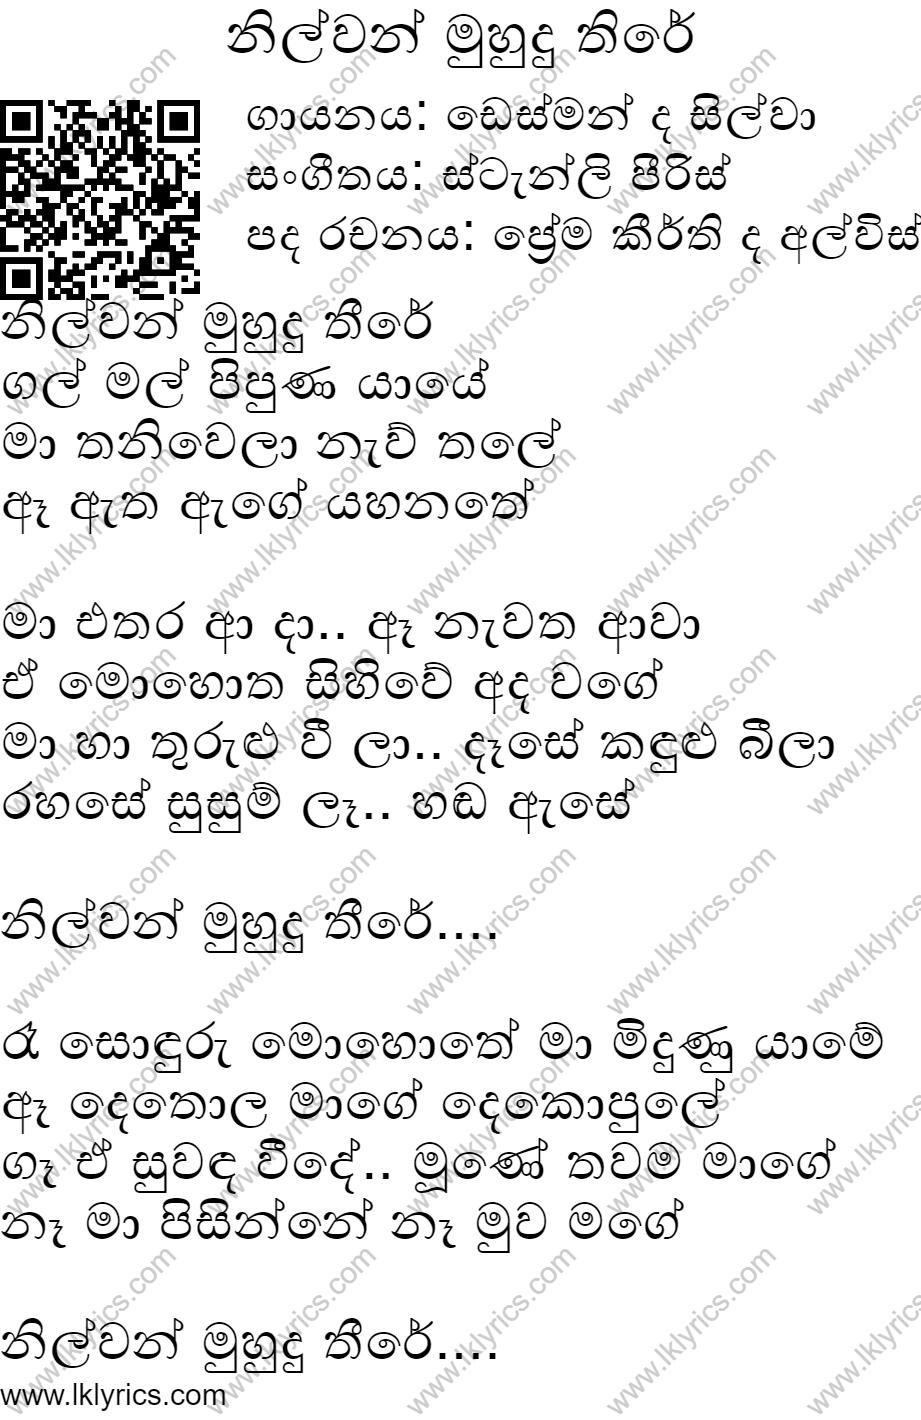 Big Harsha Ft. Kaizer - Athamita Kaasi Lyrics | Musixmatch